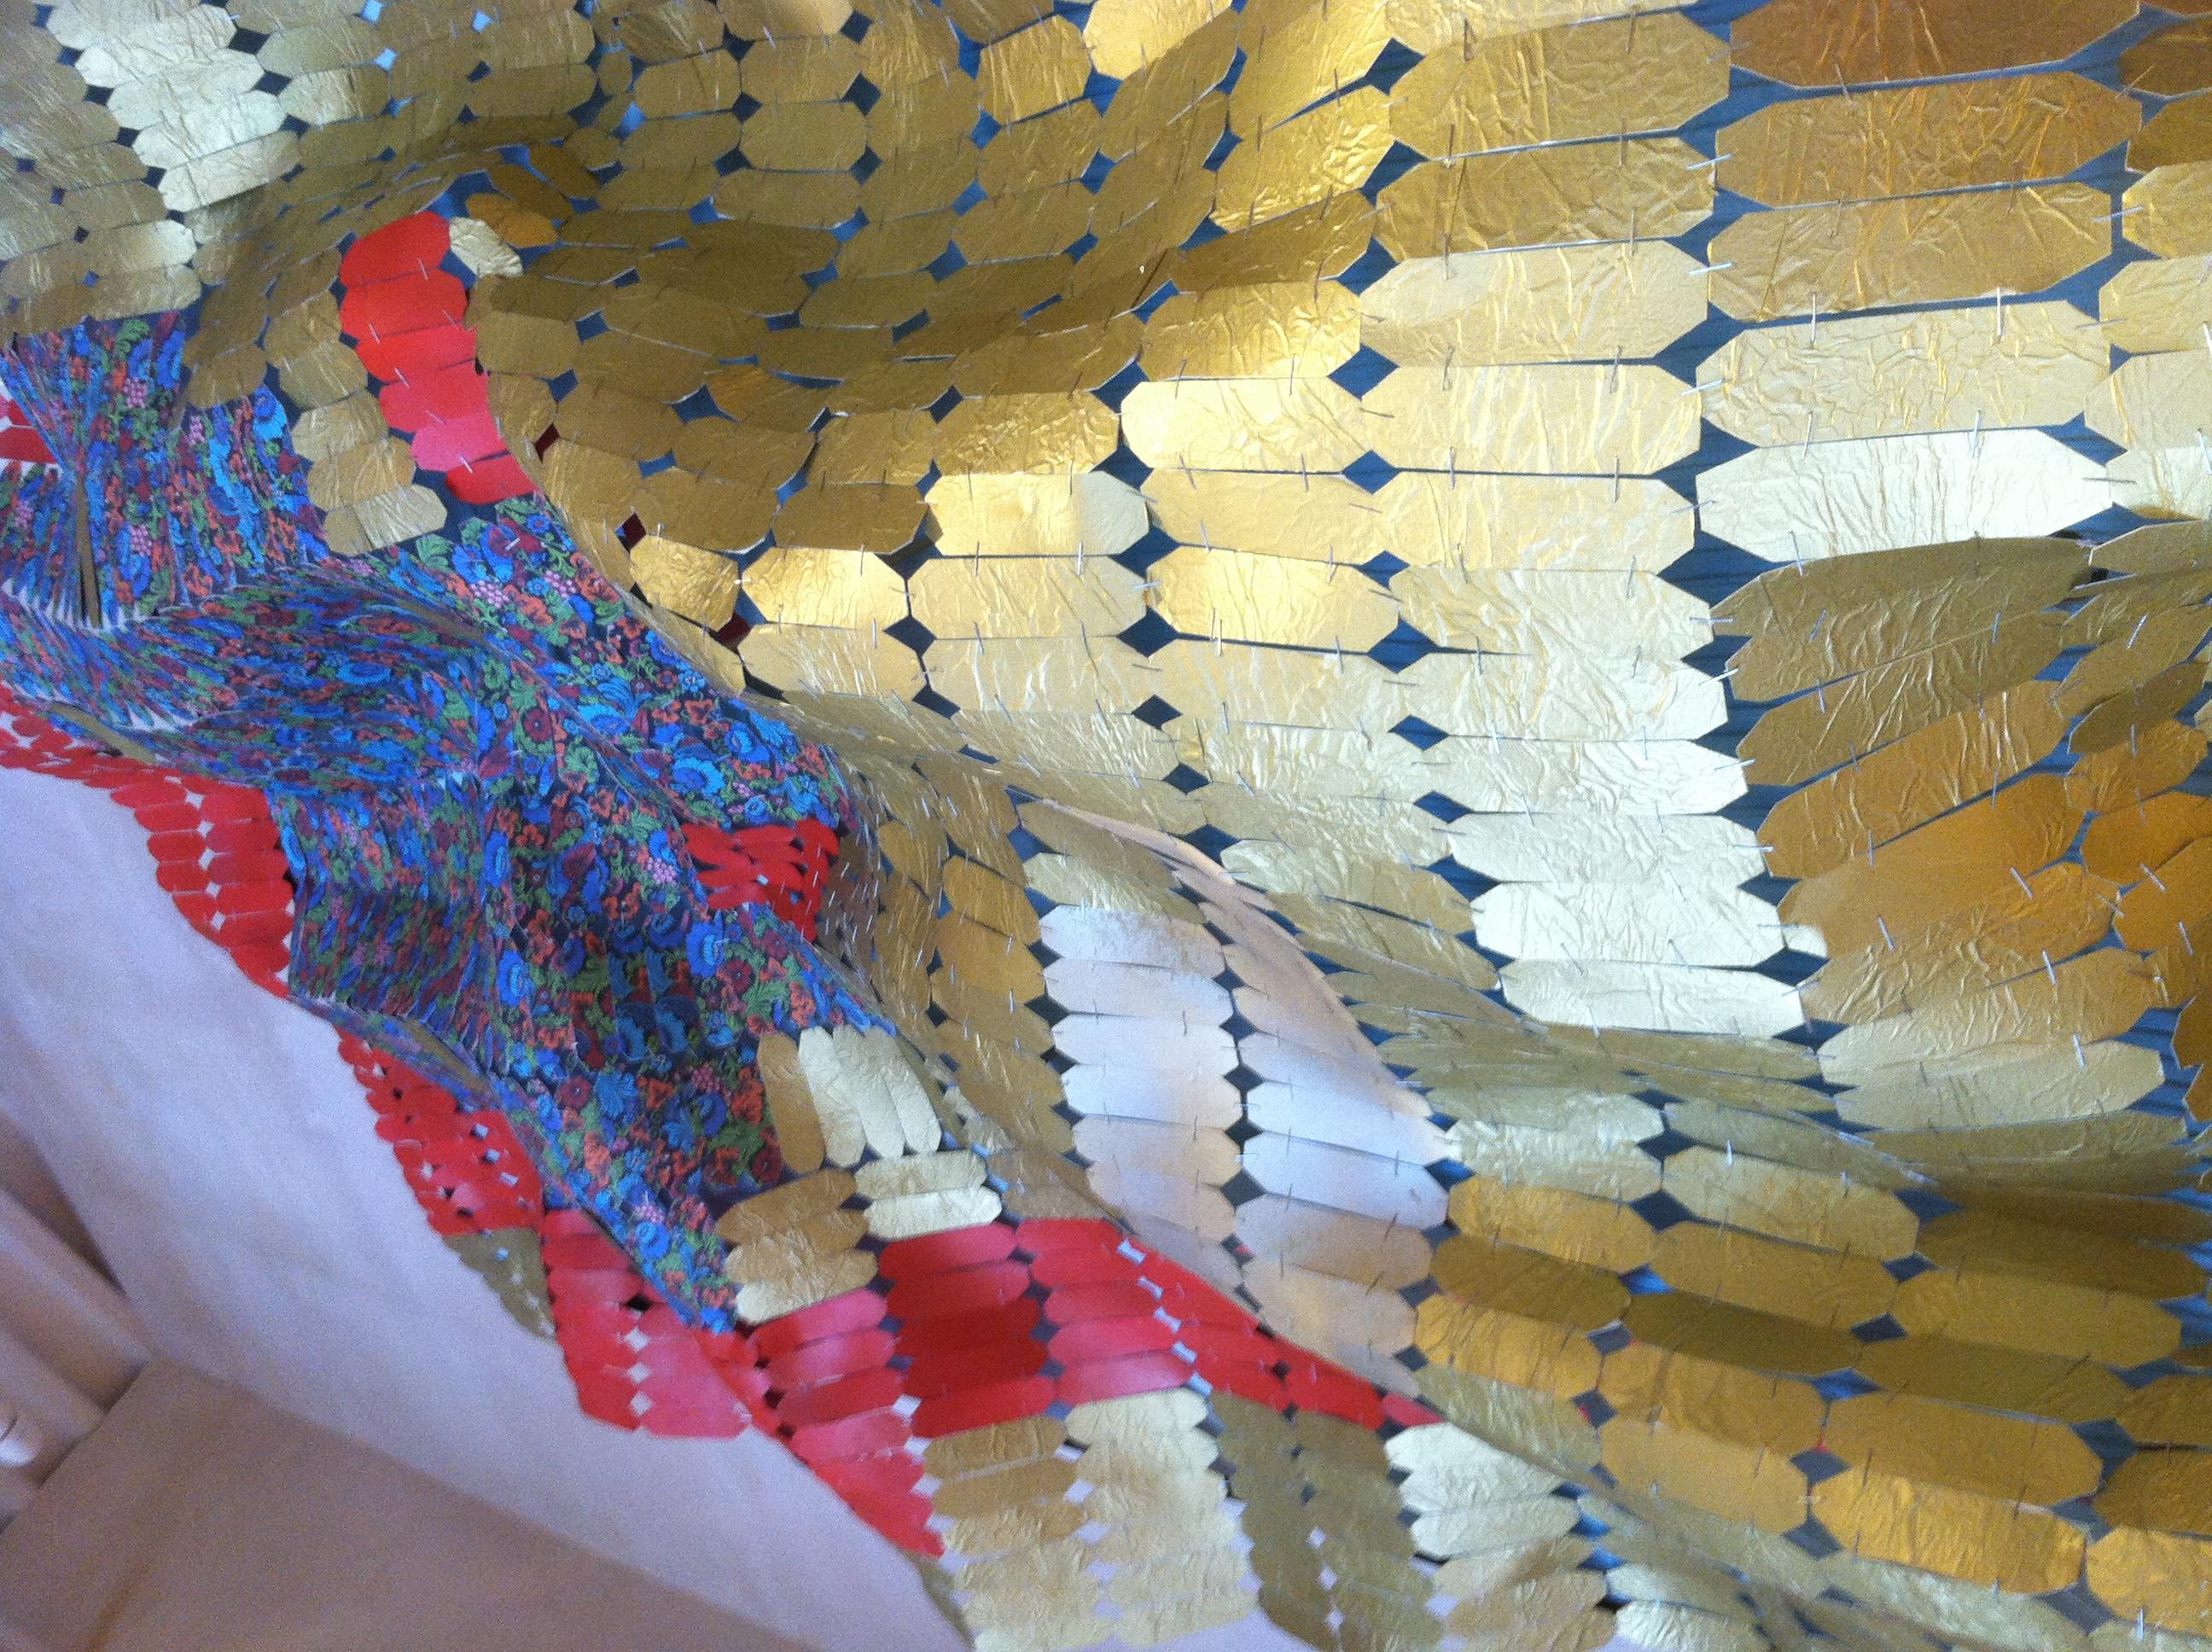 cardstock, tissue paper, staples, fabric, spray paint